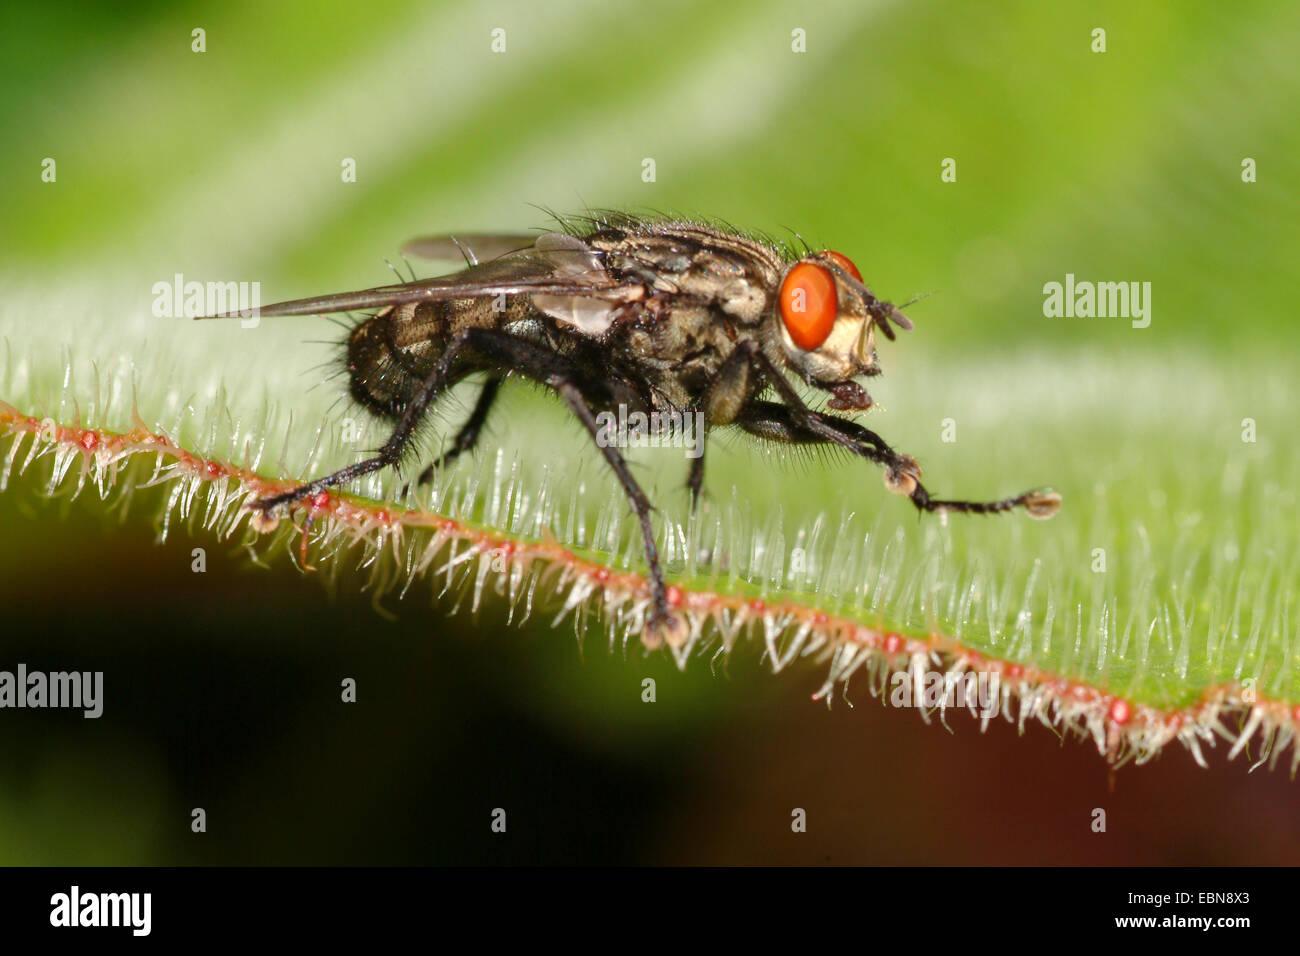 Flesh Fly (Sarcophaga spec.), sitting on a leaf - Stock Image